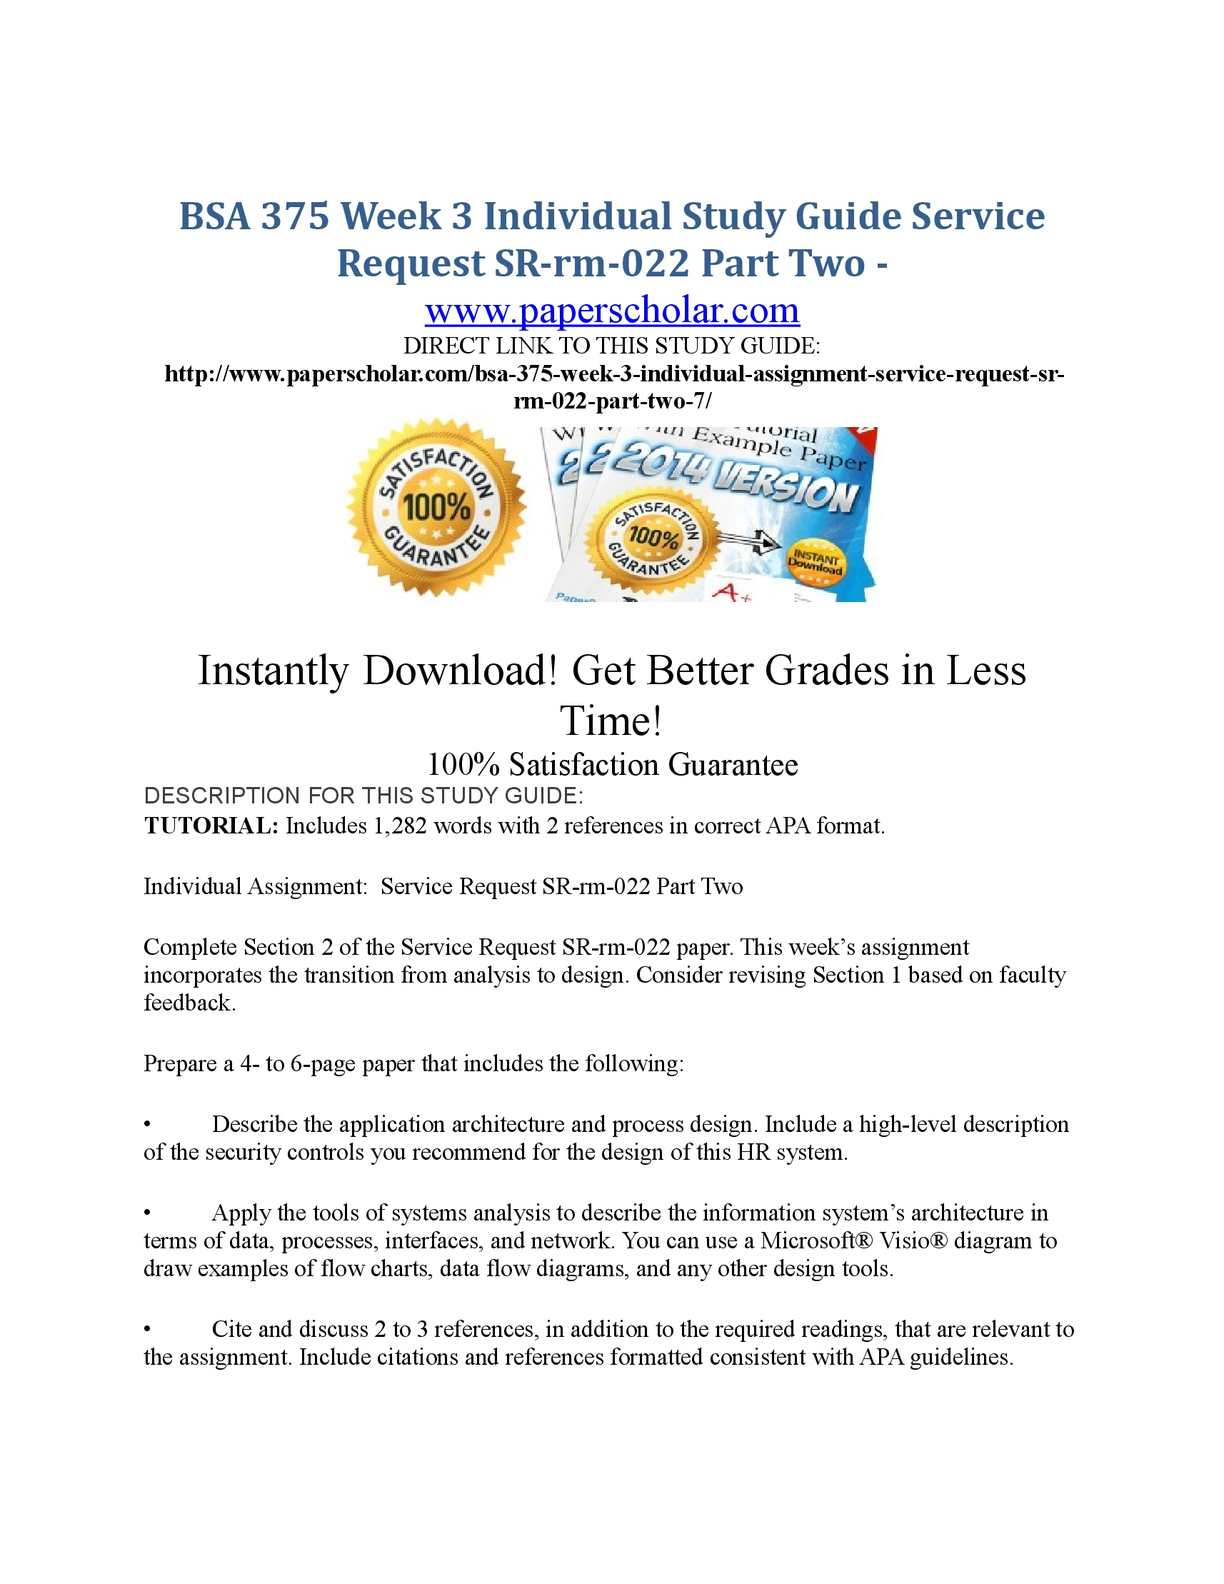 Calaméo - BSA 375 Week 3 Individual Study Guide Service